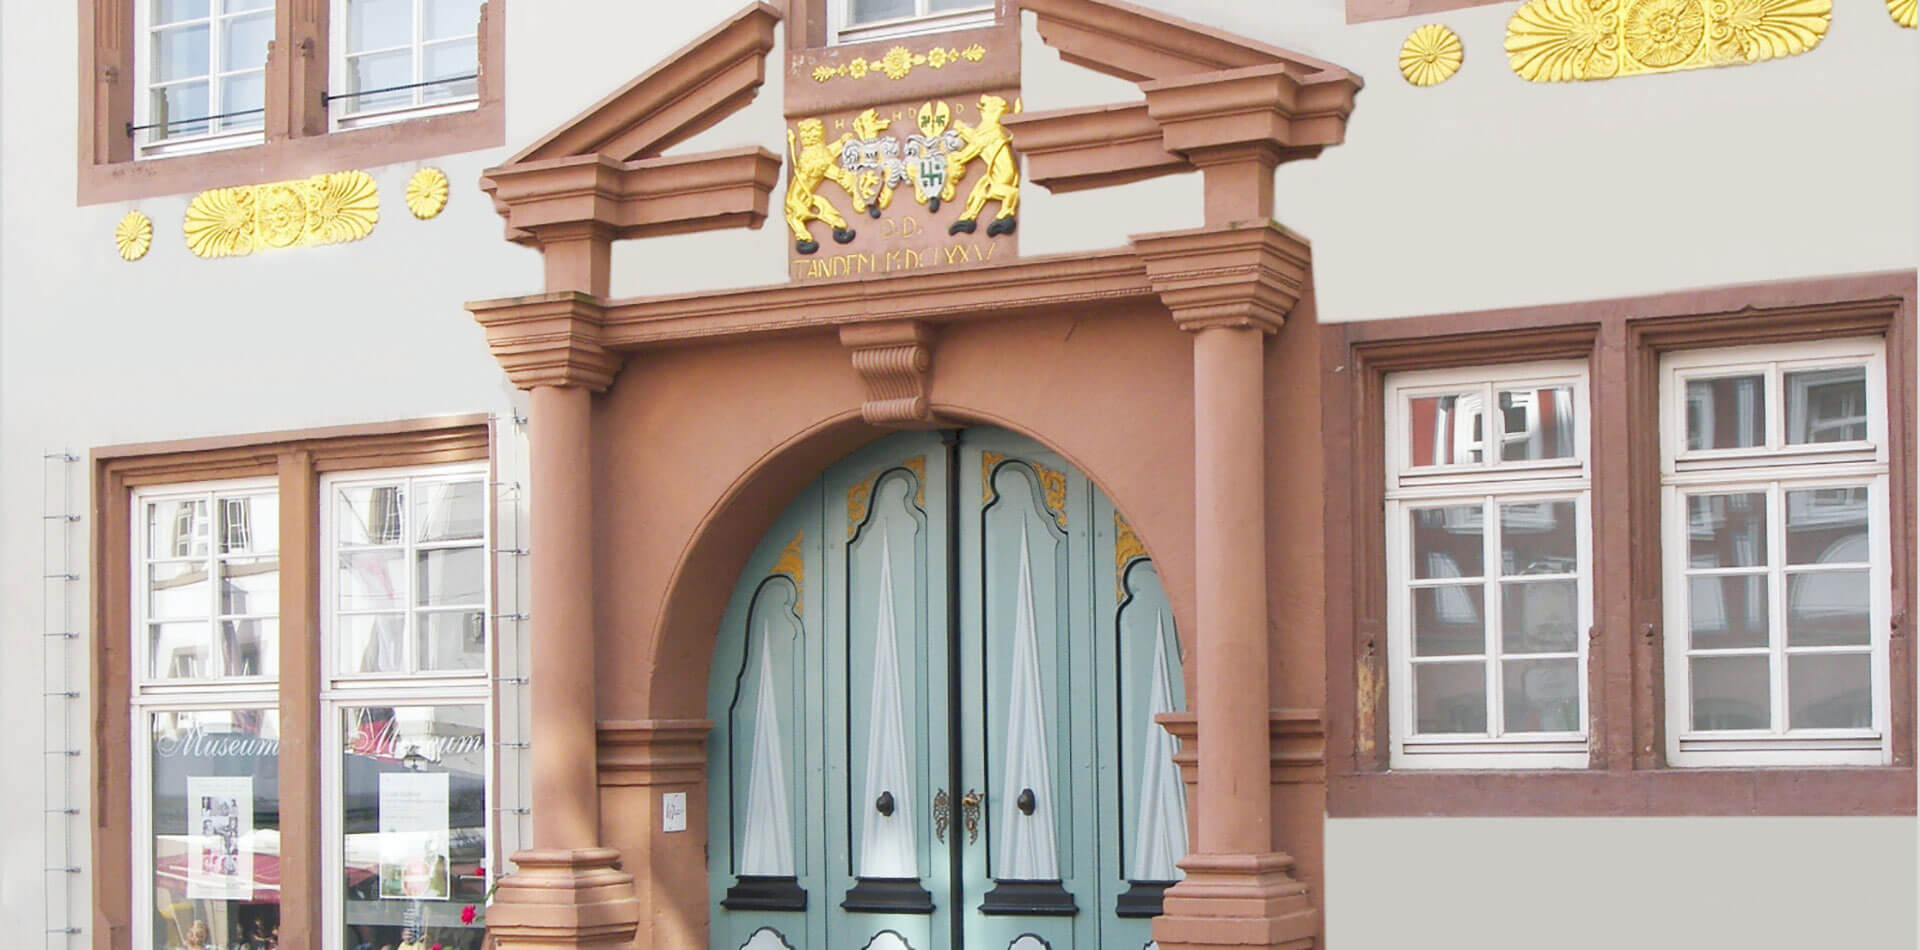 Das Haus der Romantik in Marburg, Credits Anton Lyubimov